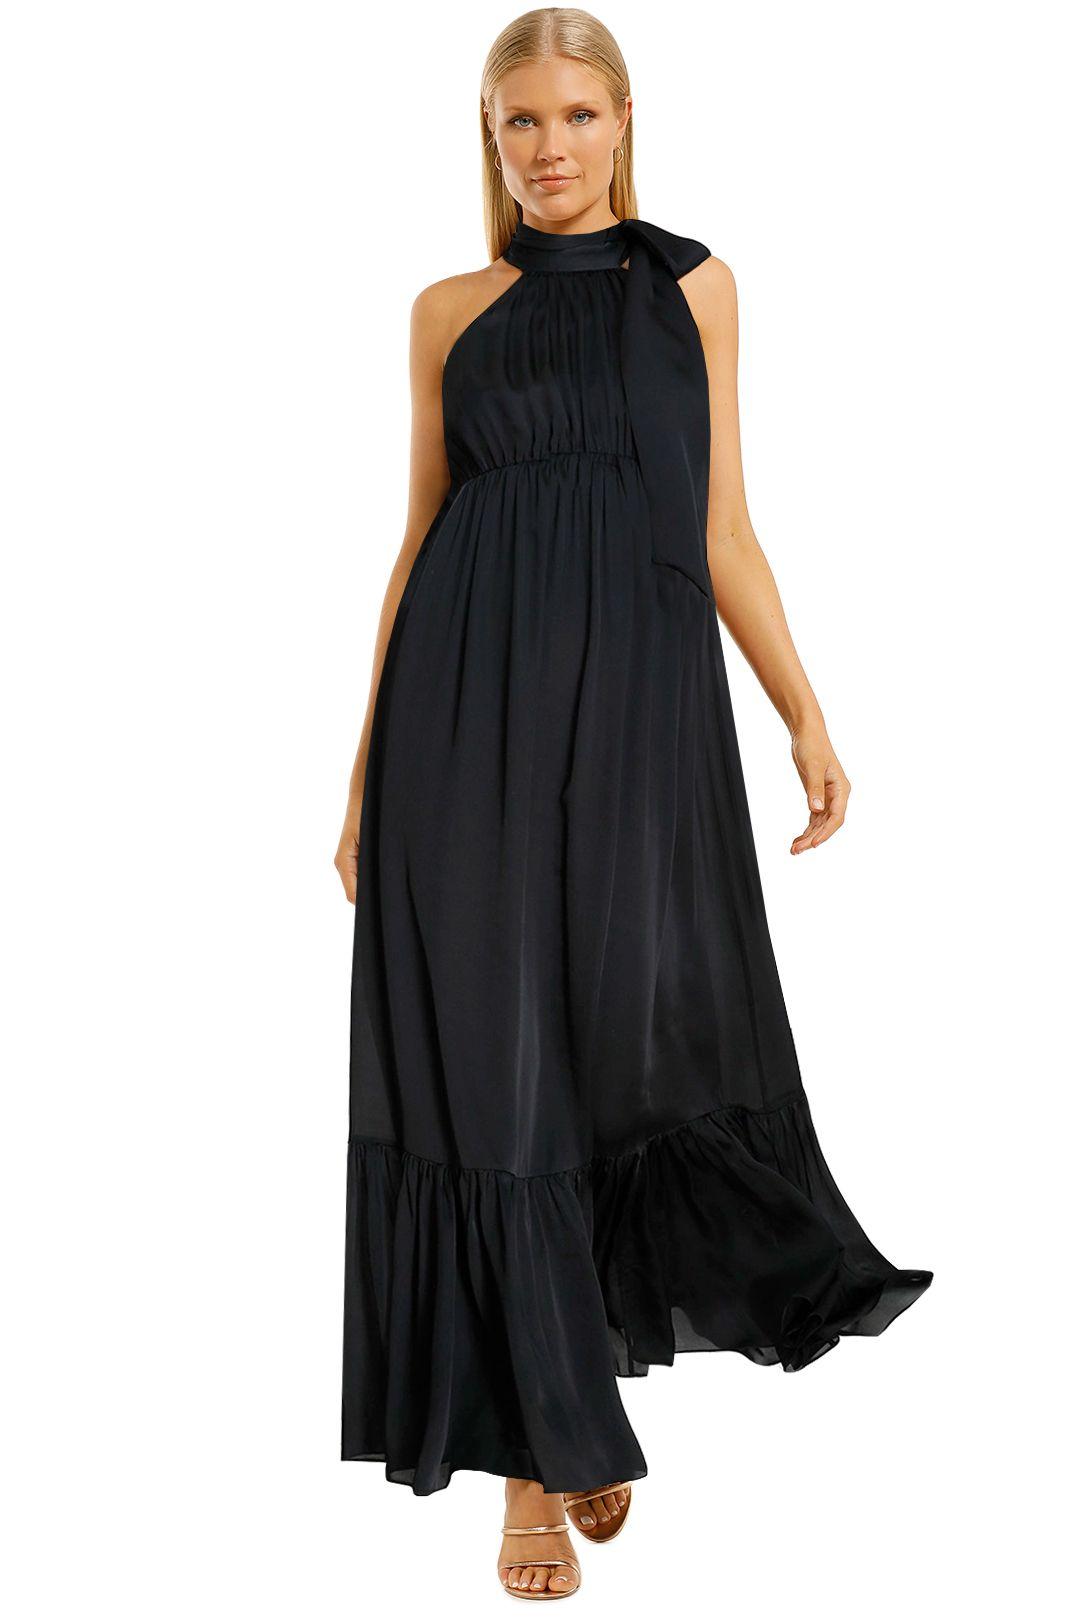 Zimmermann-Gathered-Bow-Tie-Dress-Black-Front